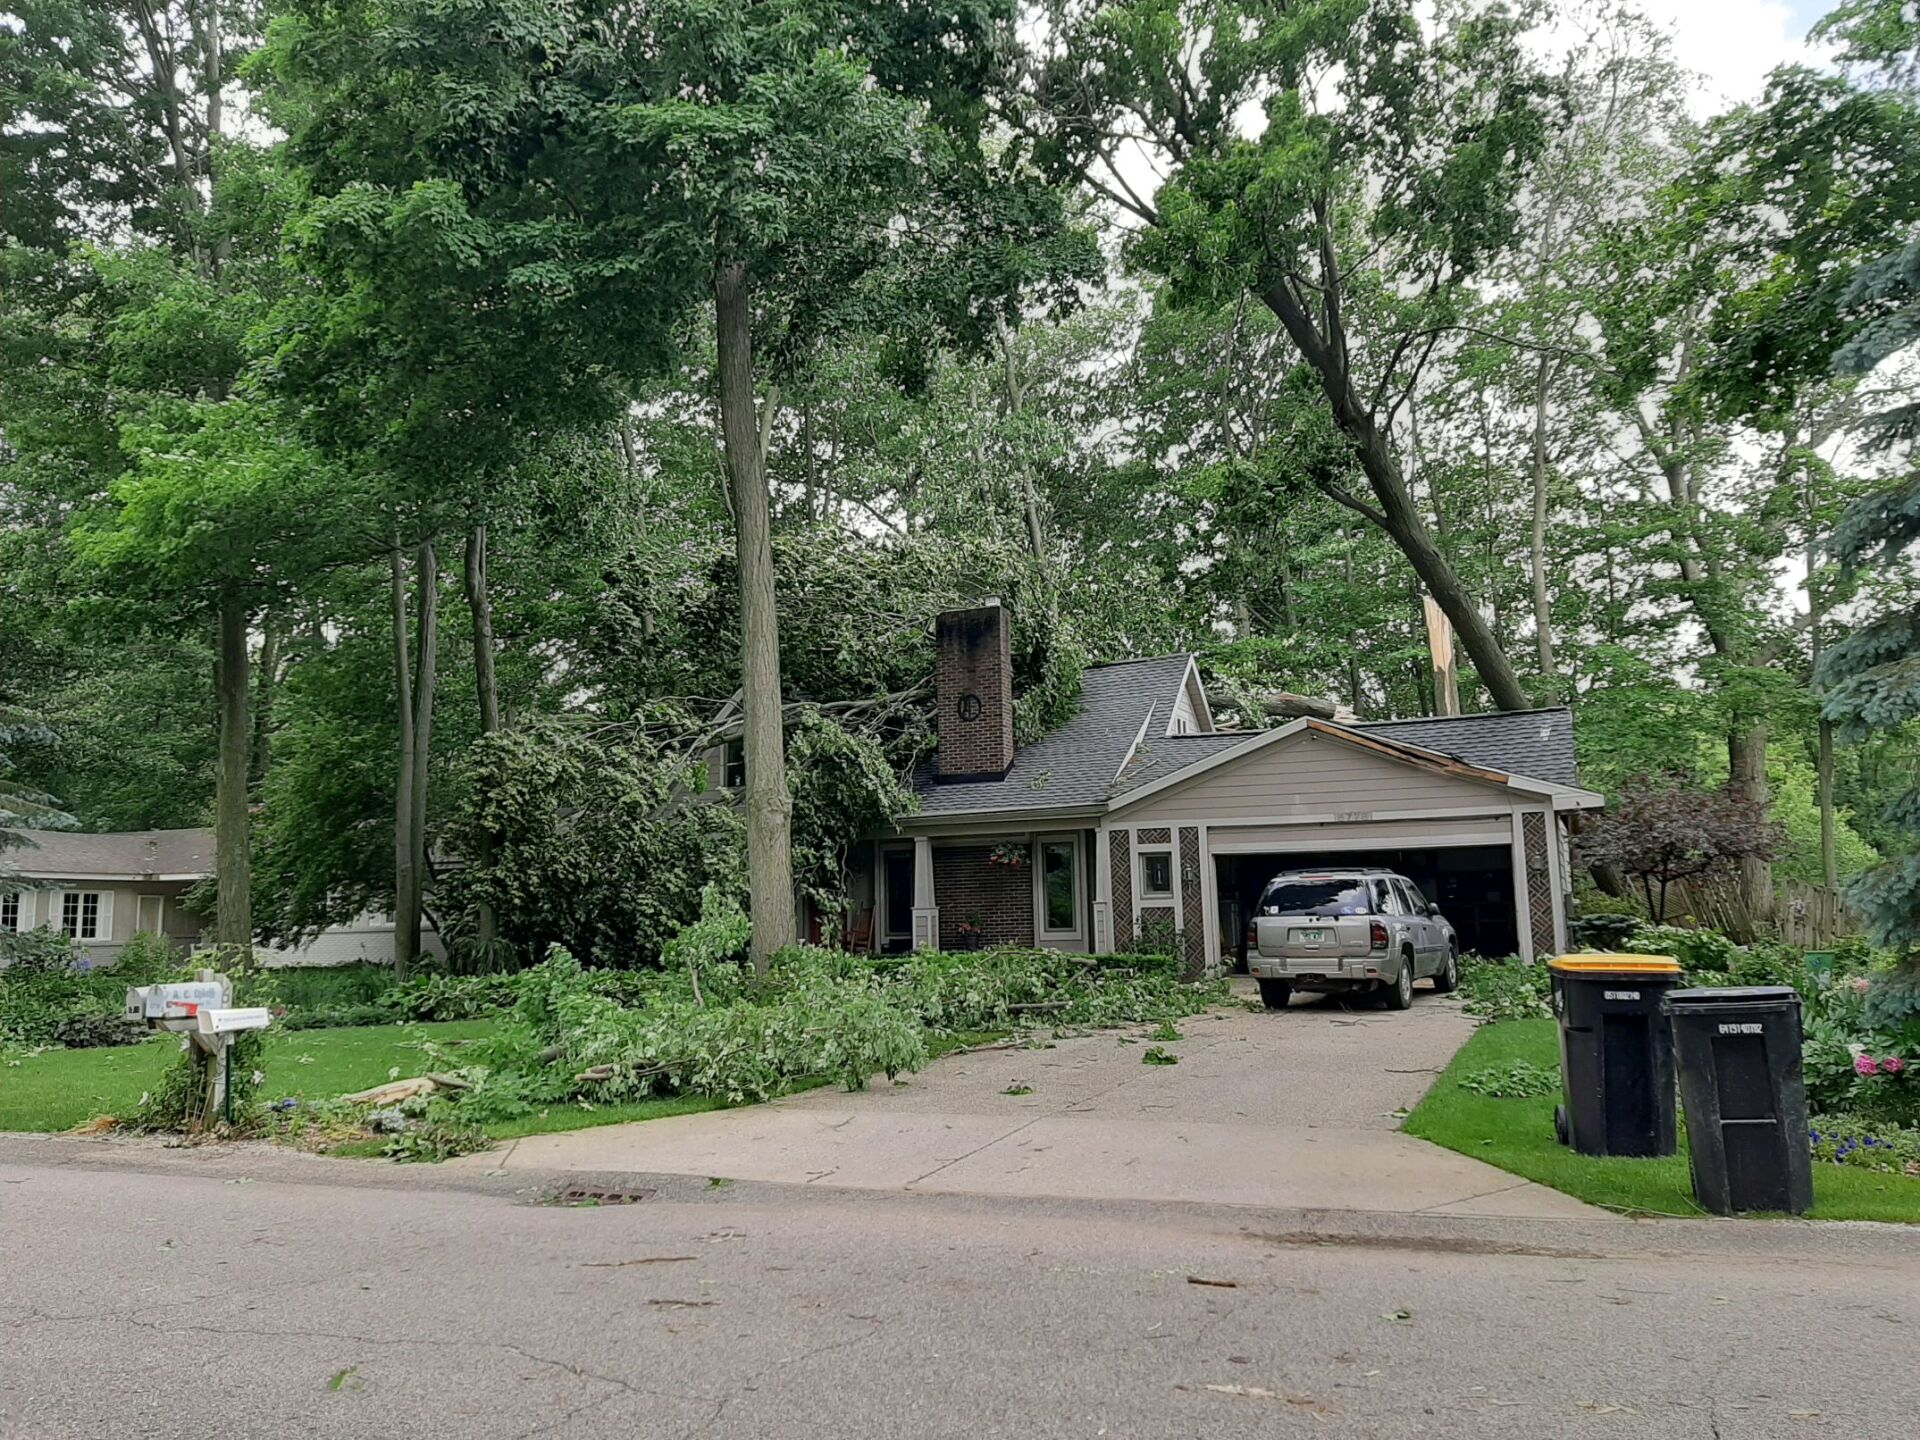 Gerogetown township storm damage 4.jpg